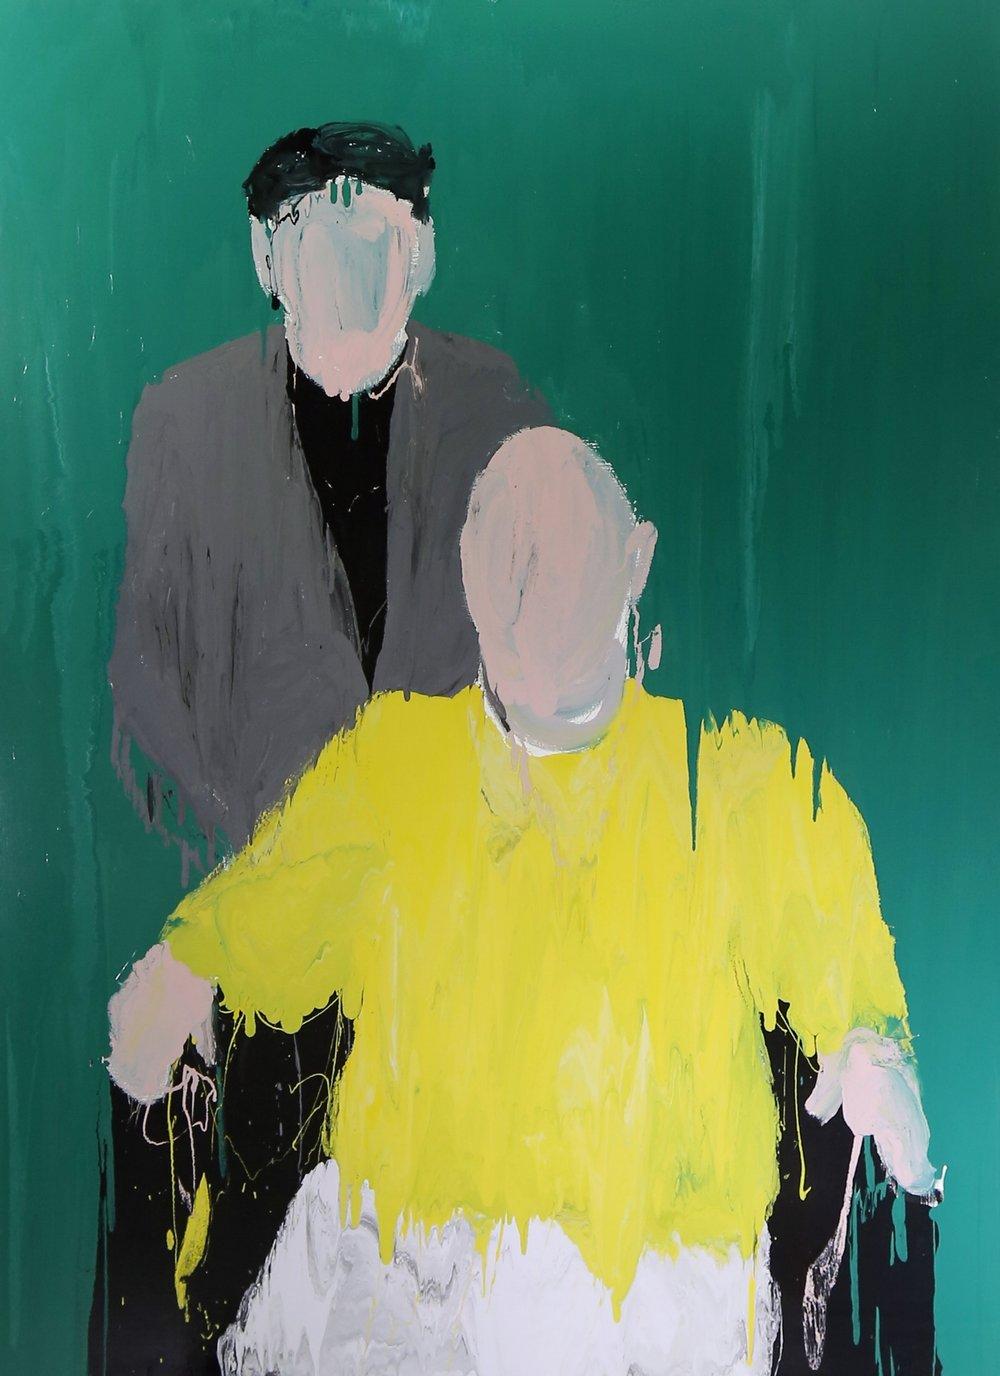 Family portrait III: Roman and Vittorio, 2016, enamel paint on canvas, 229 x 168 cm